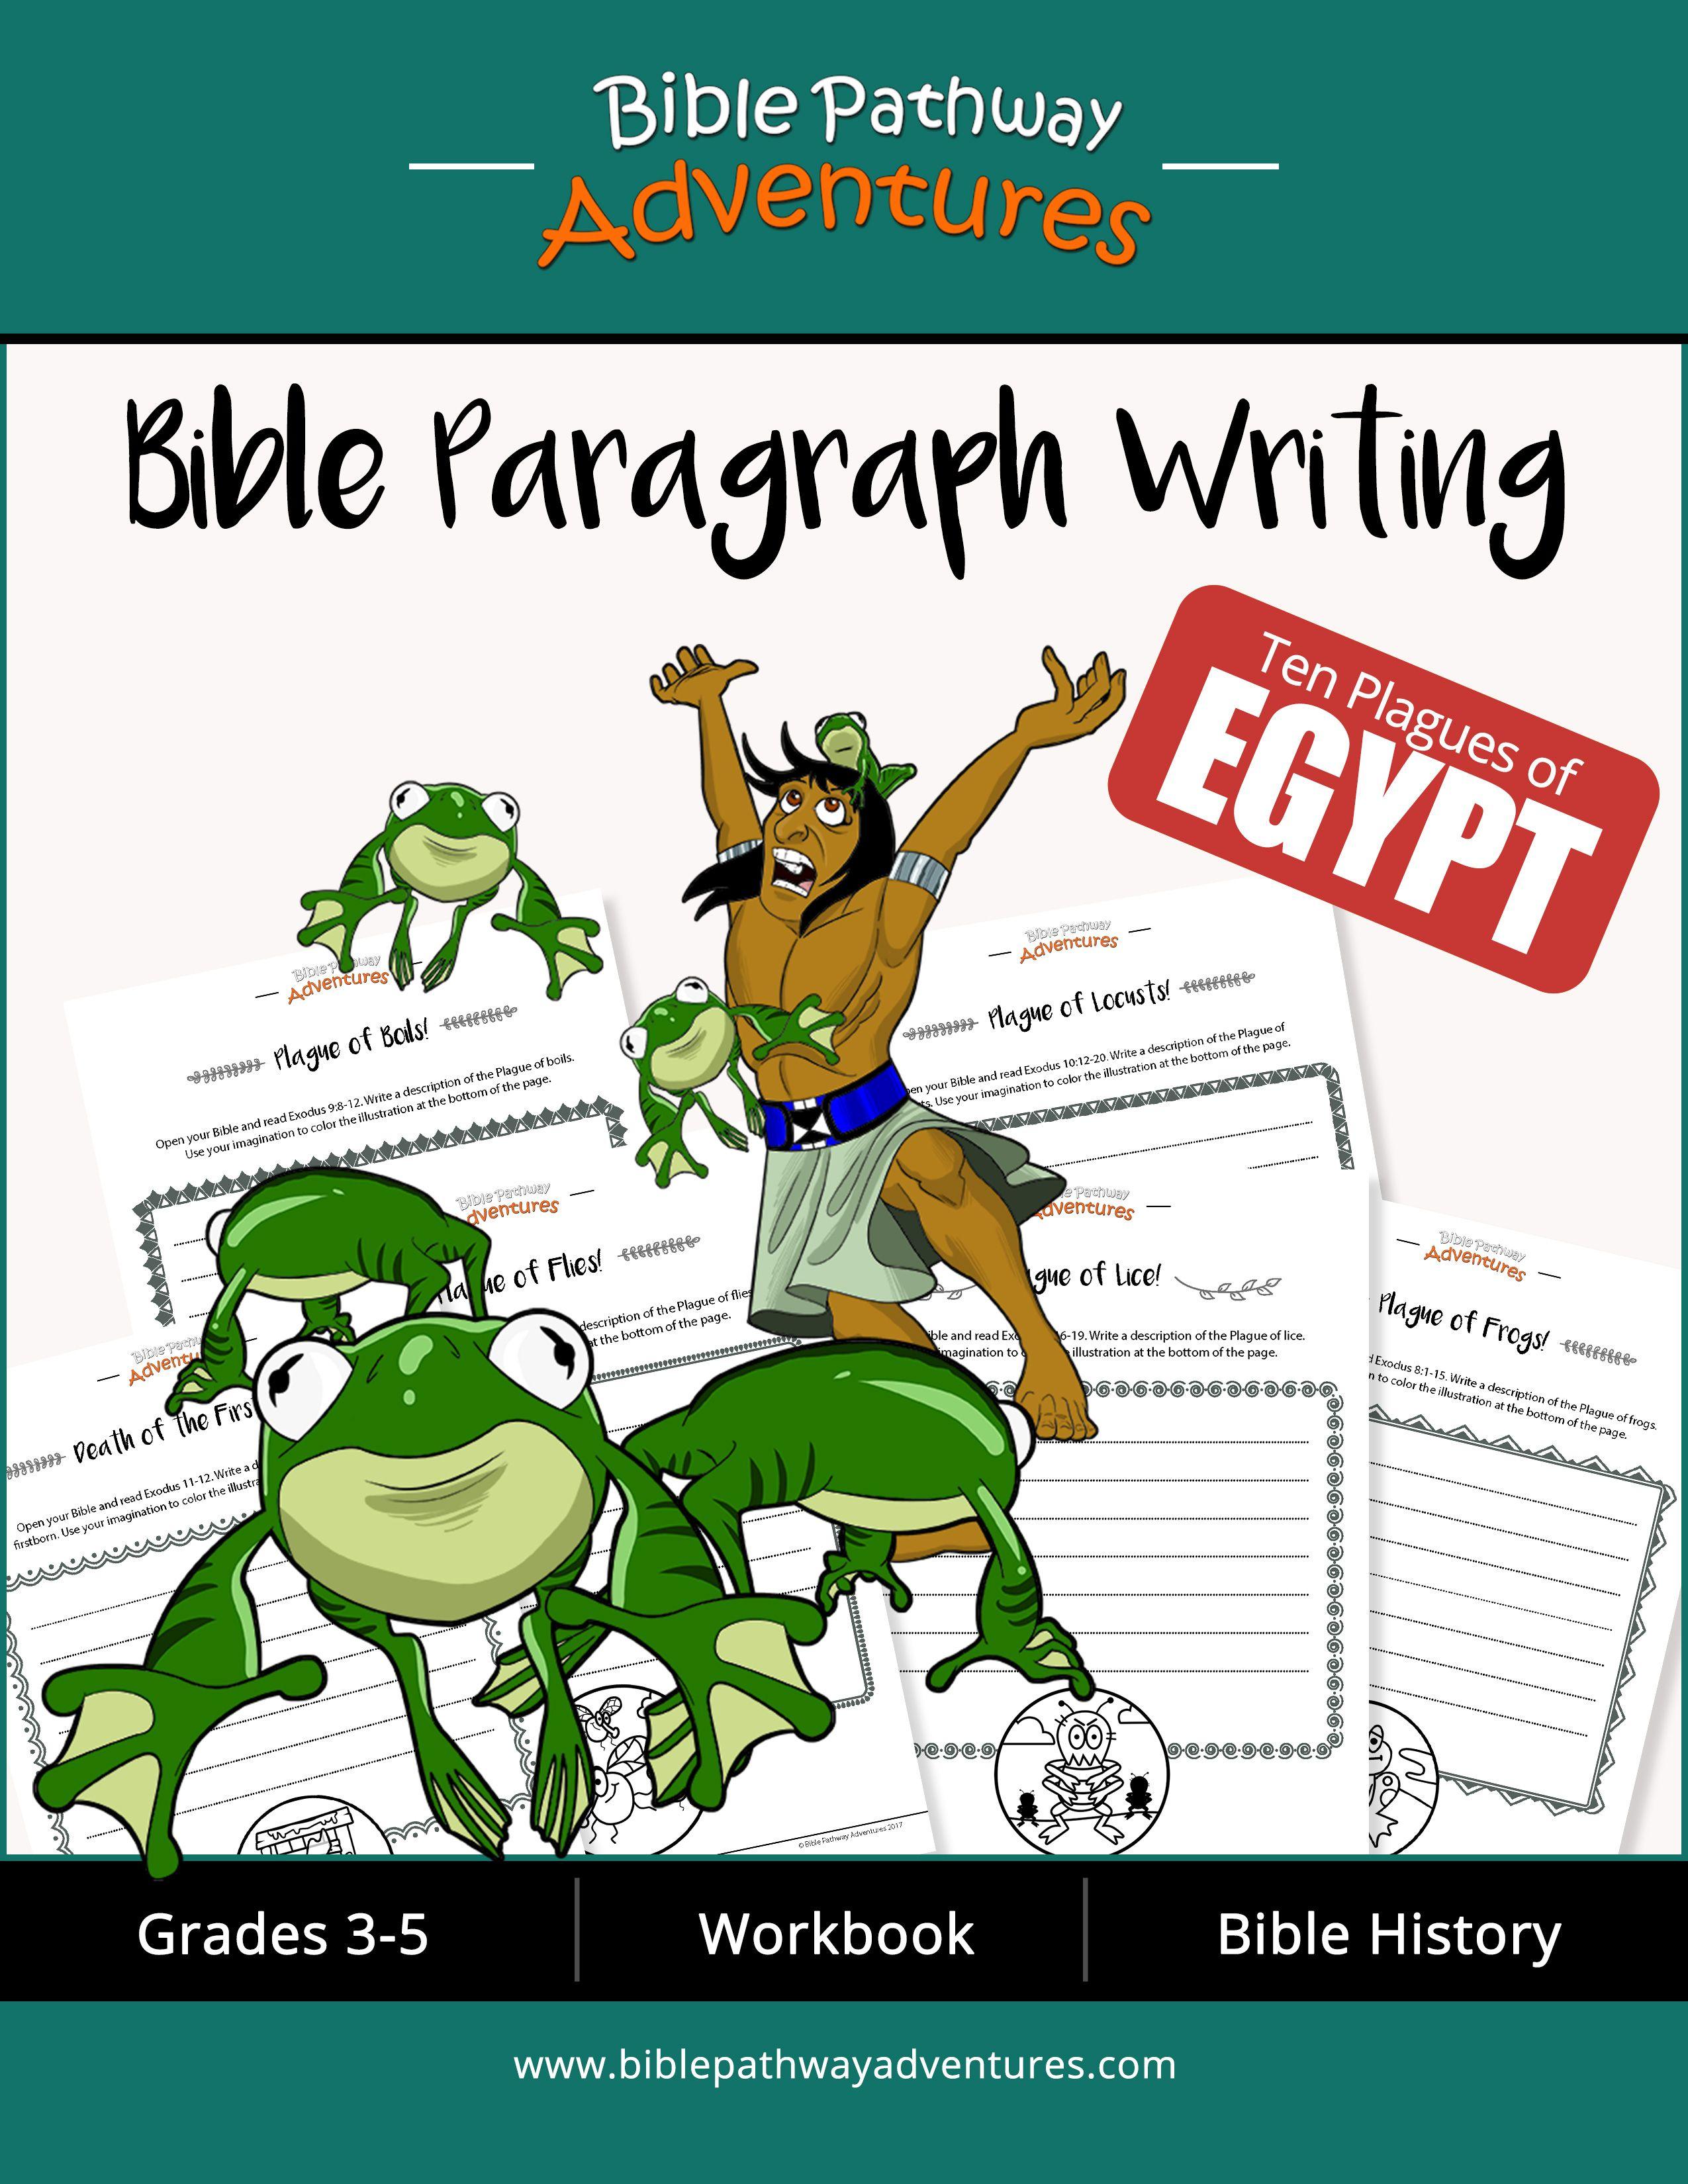 Bible Paragraph Writing Workbook